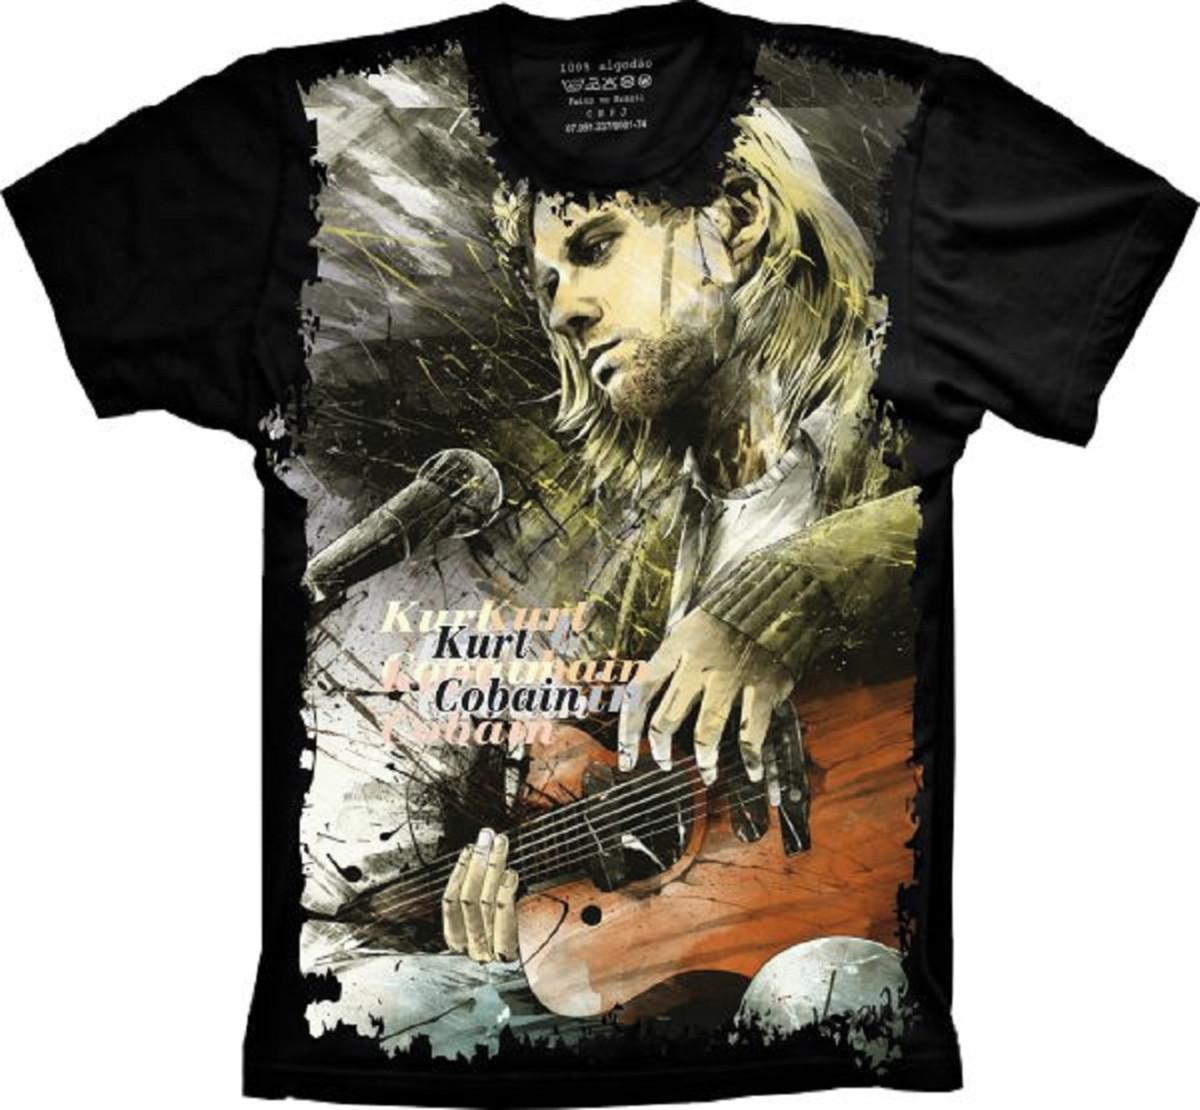 Camiseta Banda Nirvana Kurt Cobain no Elo7  2c41be19227